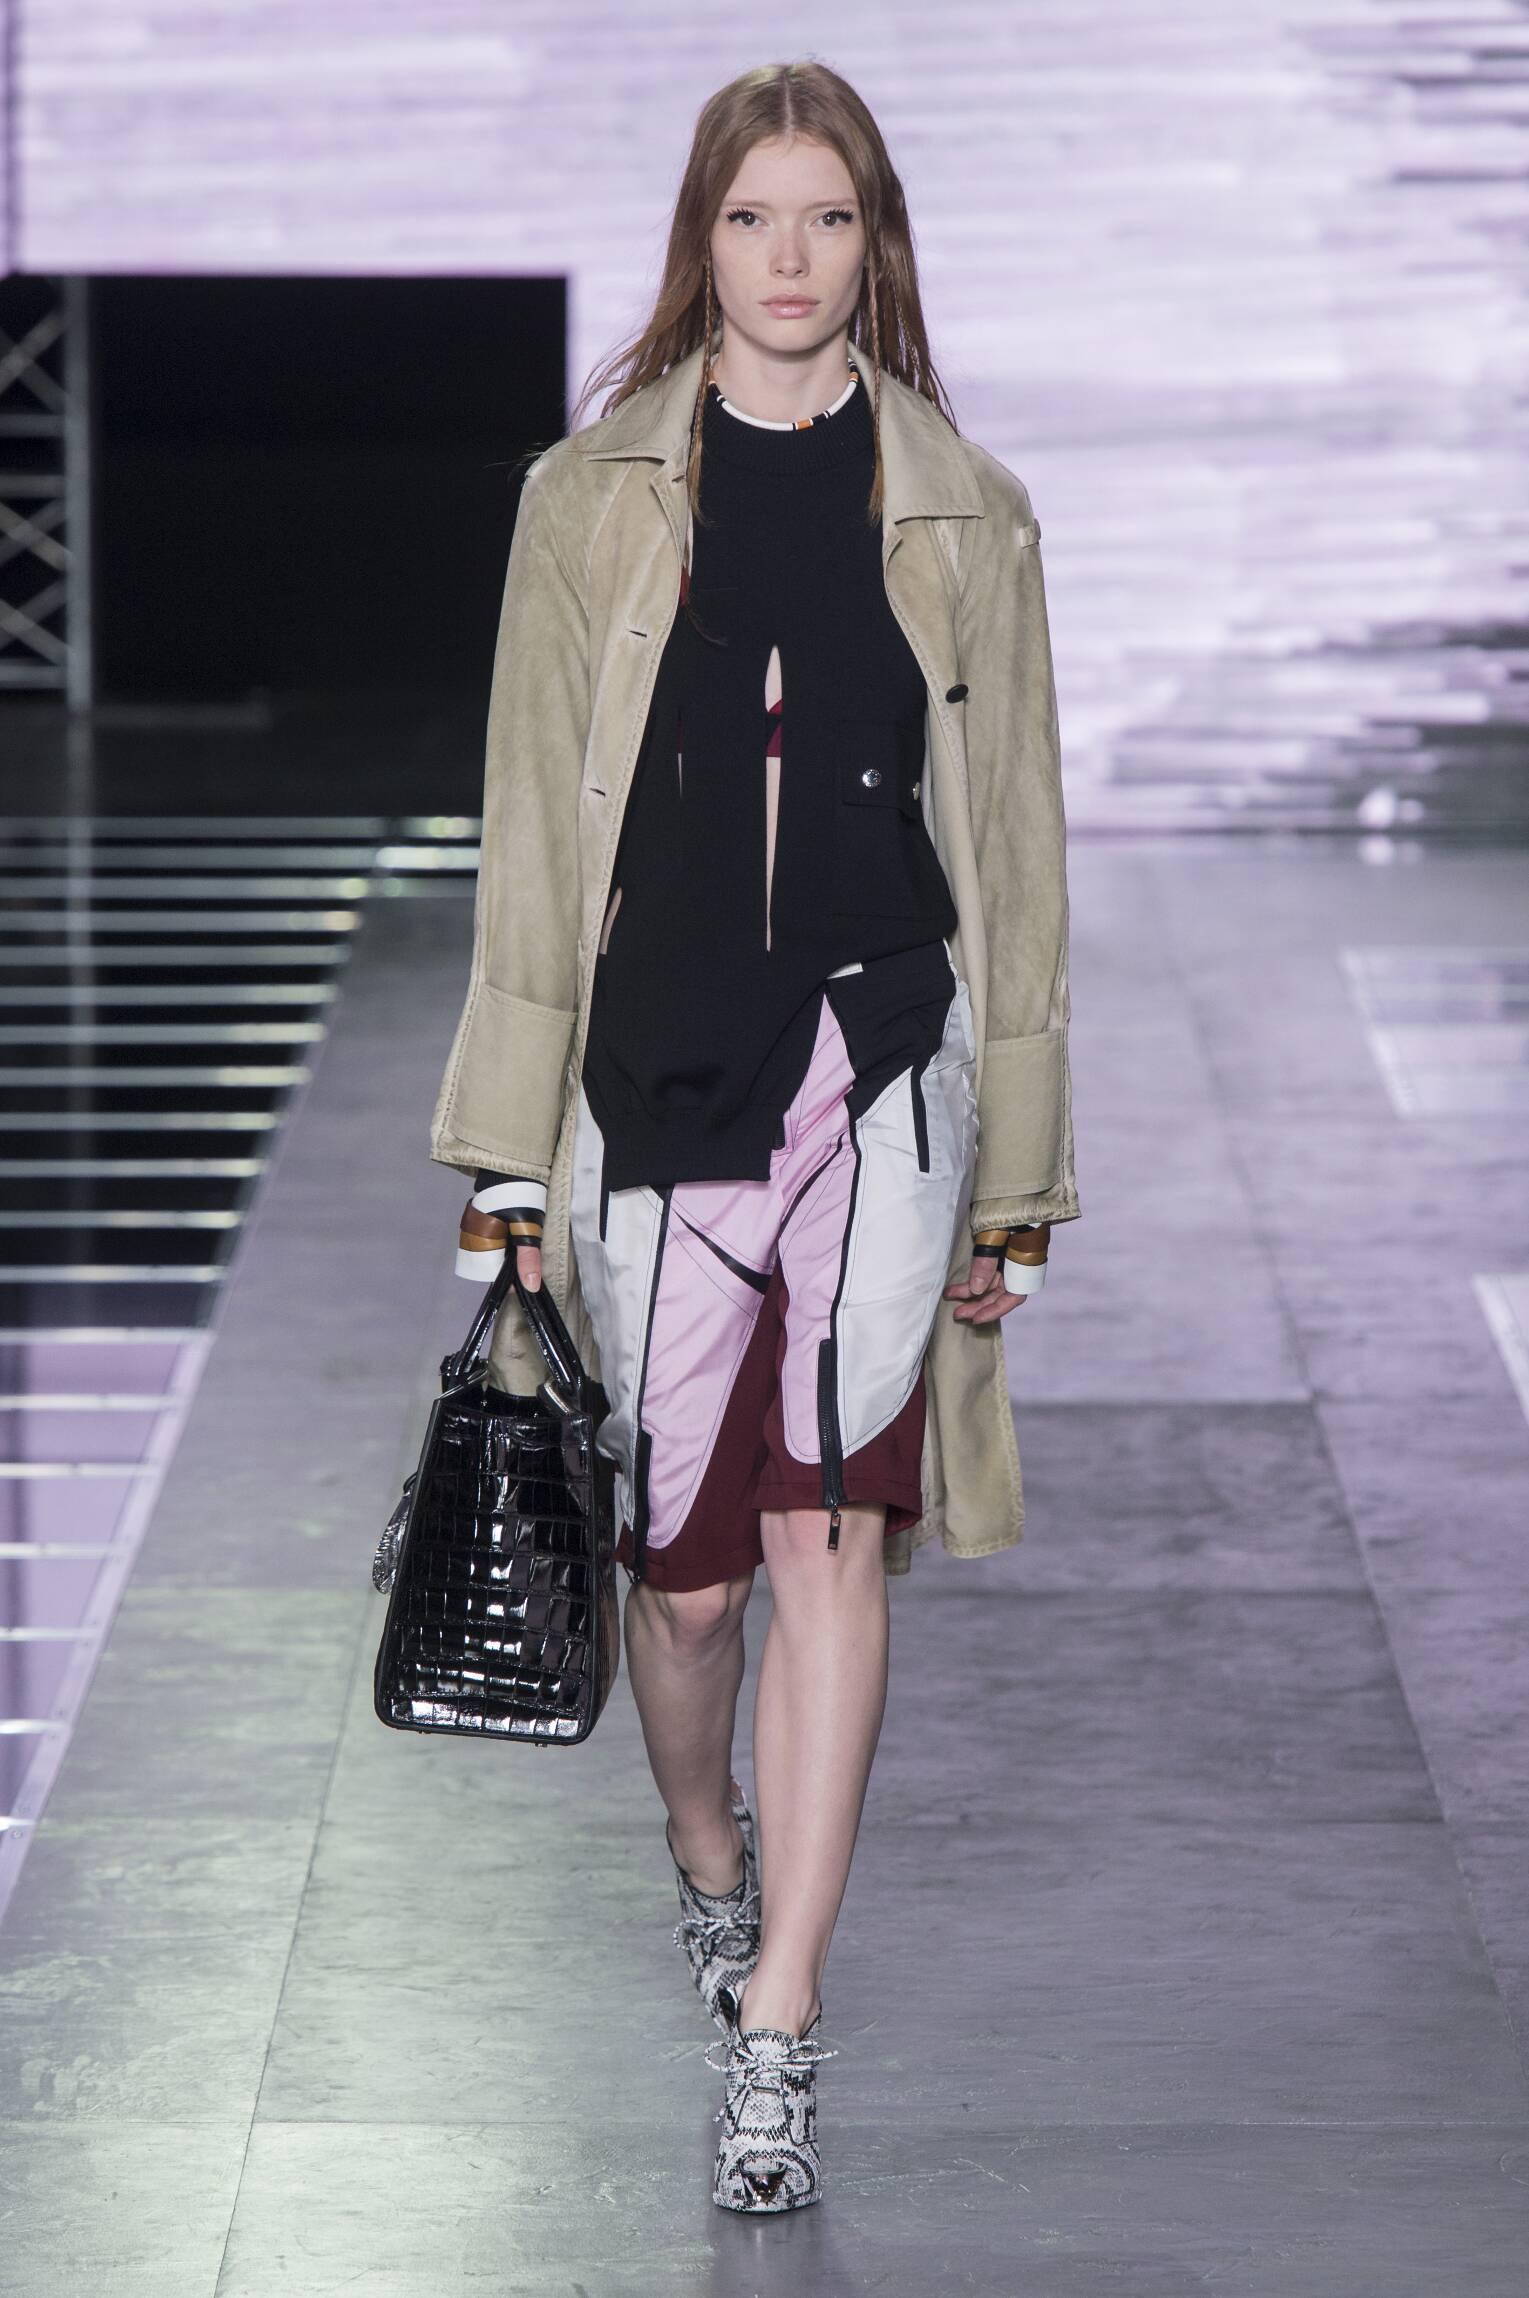 Catwalk Louis Vuitton Woman Fashion Show Summer 2016